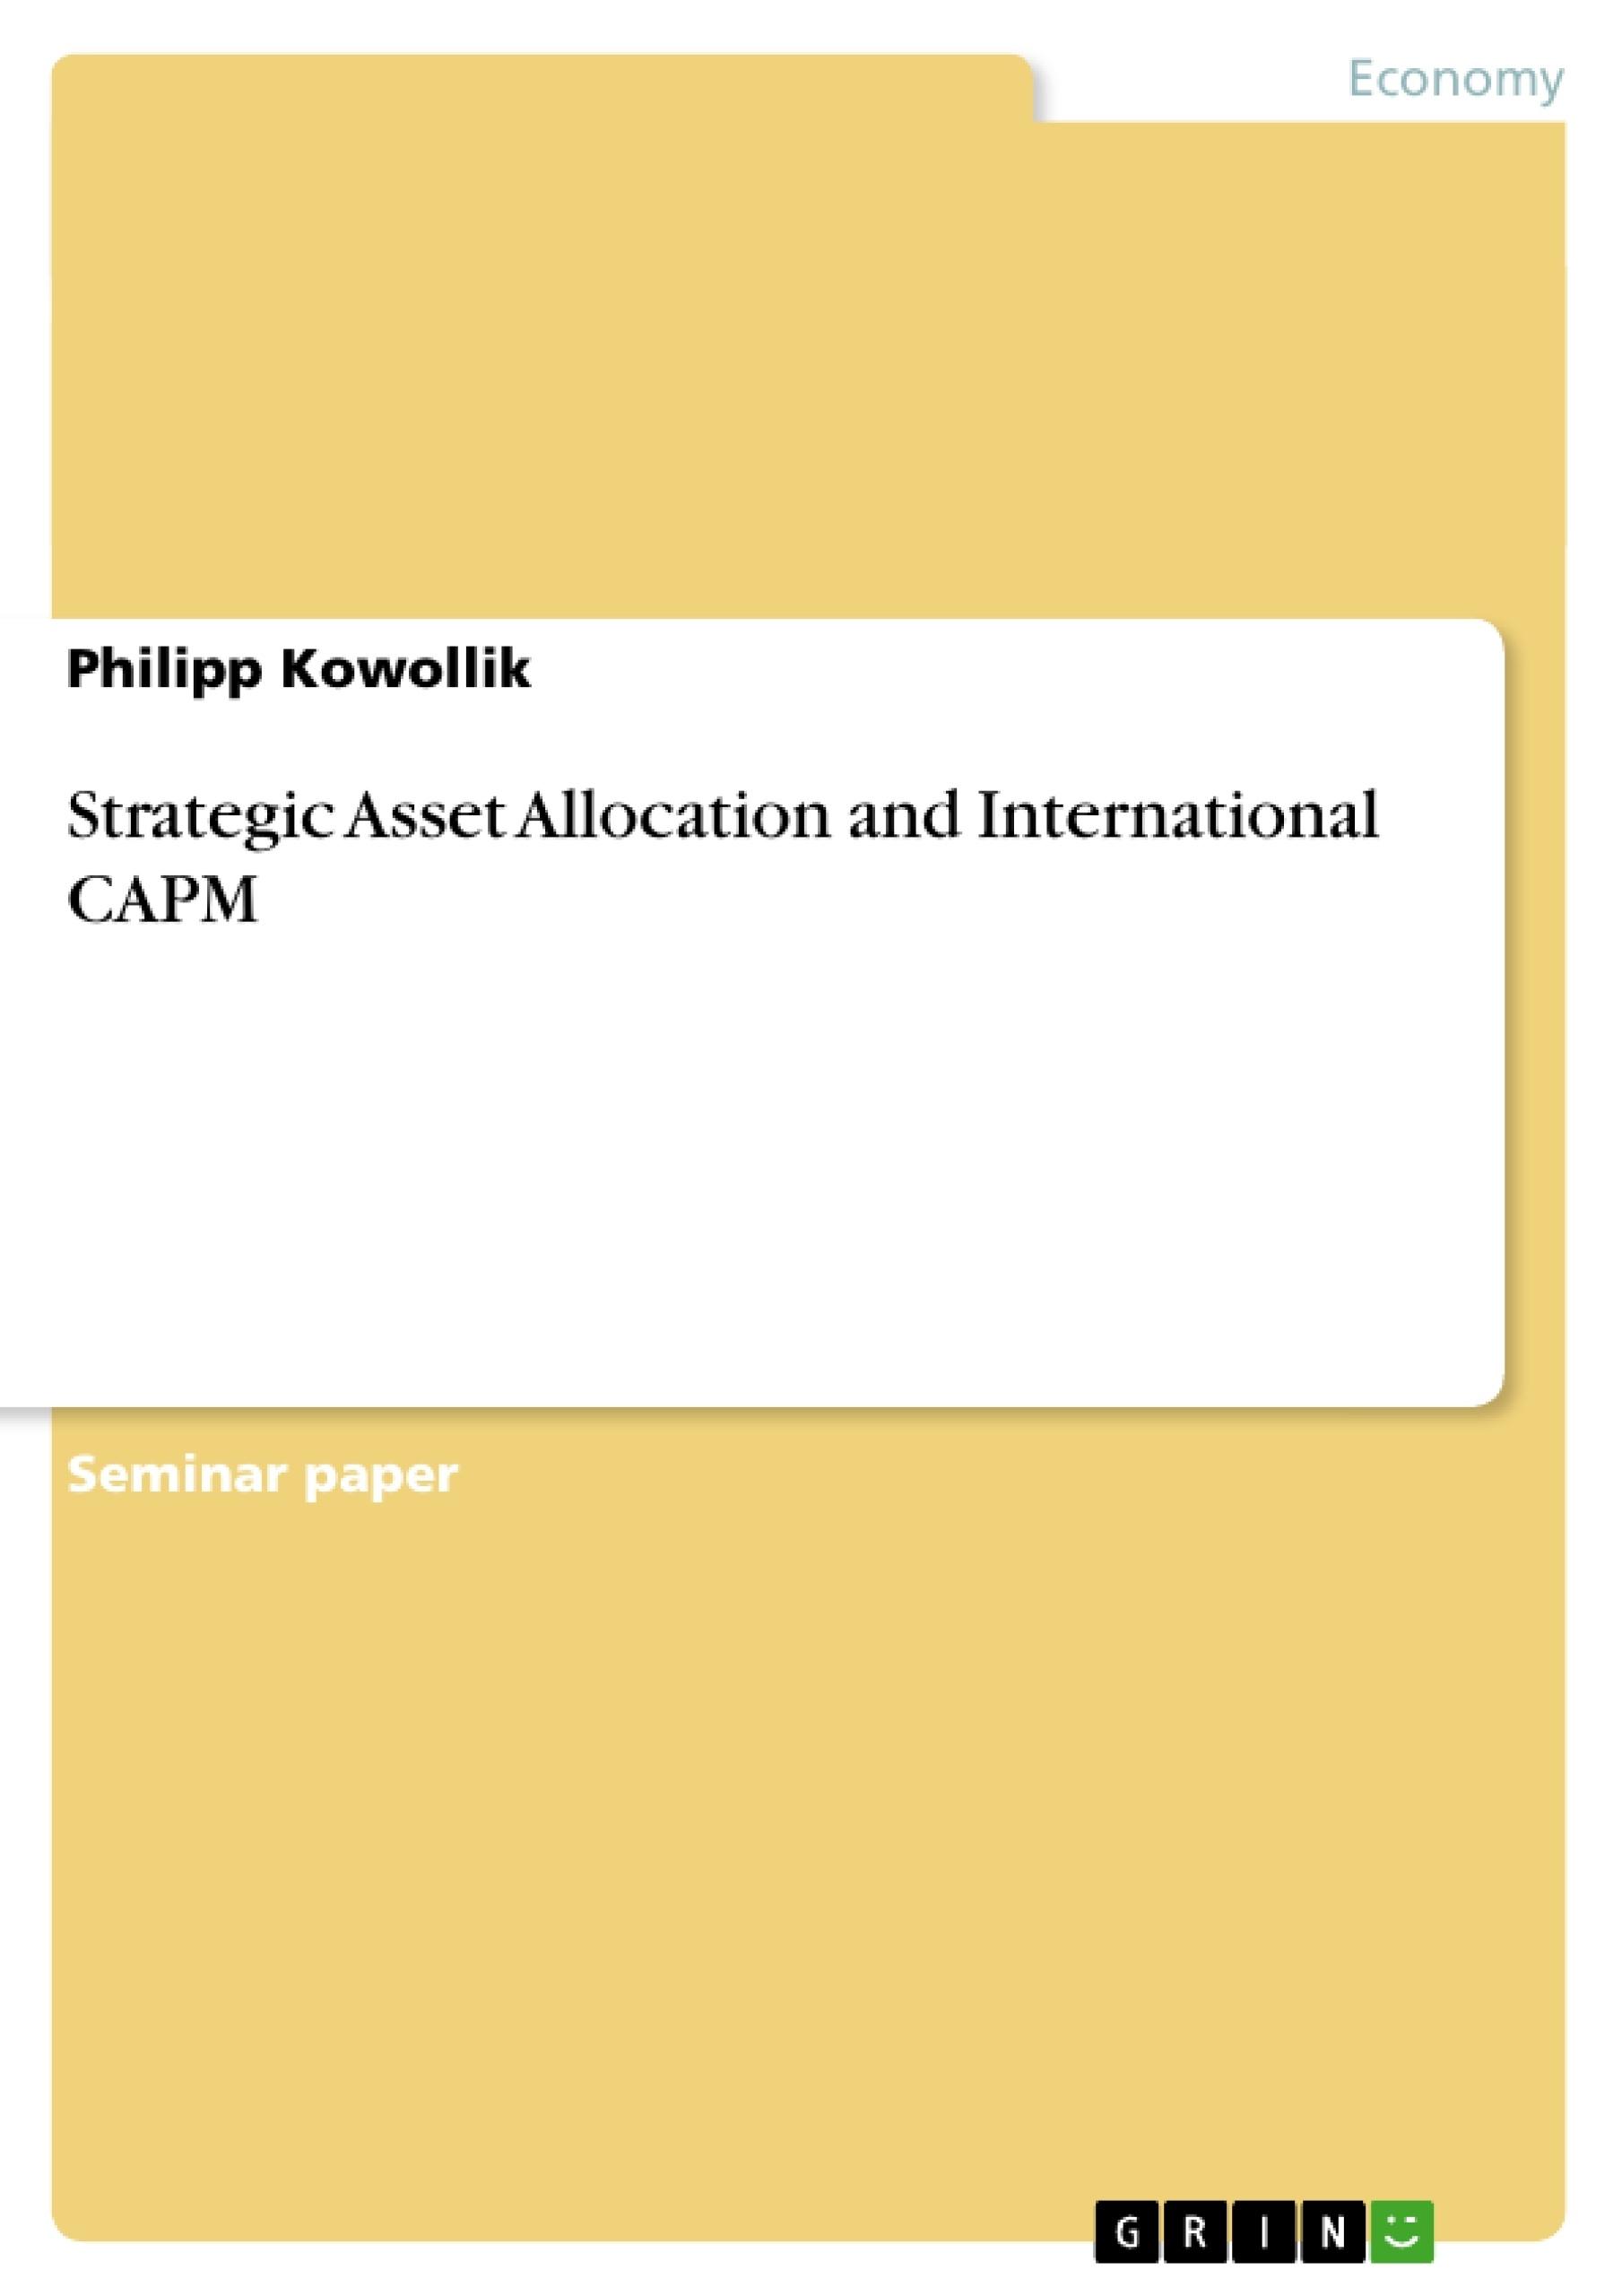 Title: Strategic Asset Allocation and International CAPM